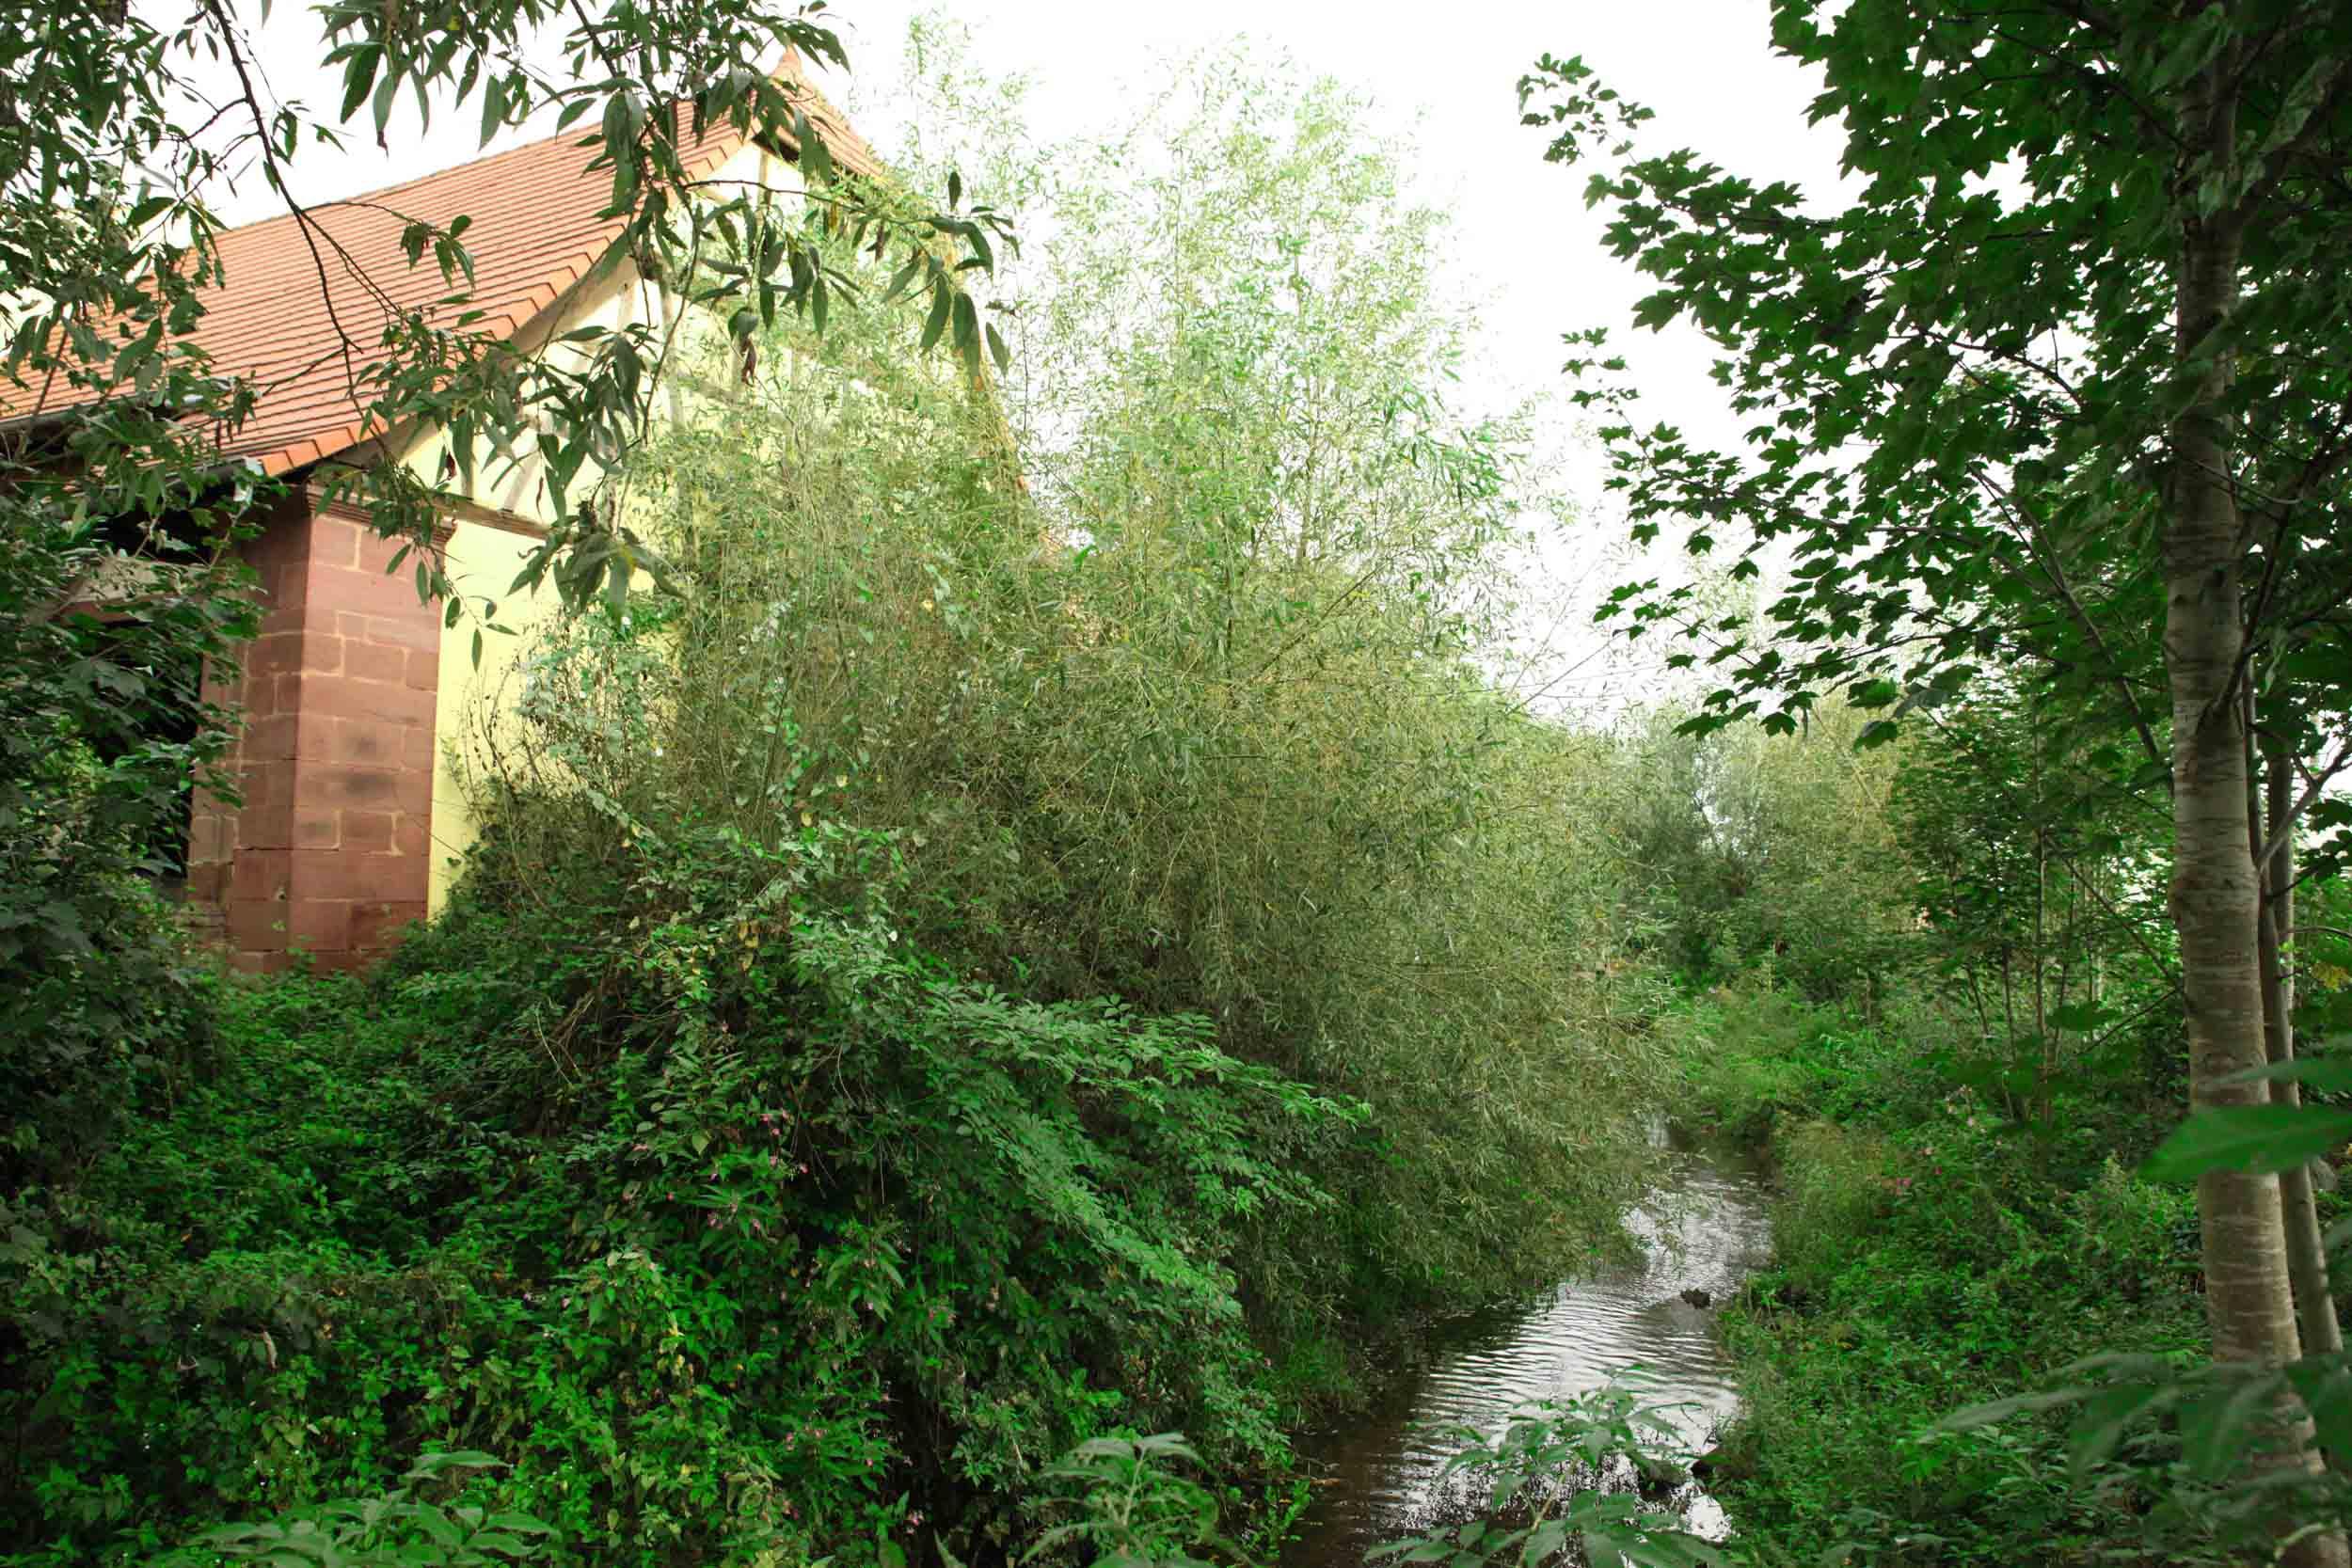 moulin-des-peupliers-2.jpg